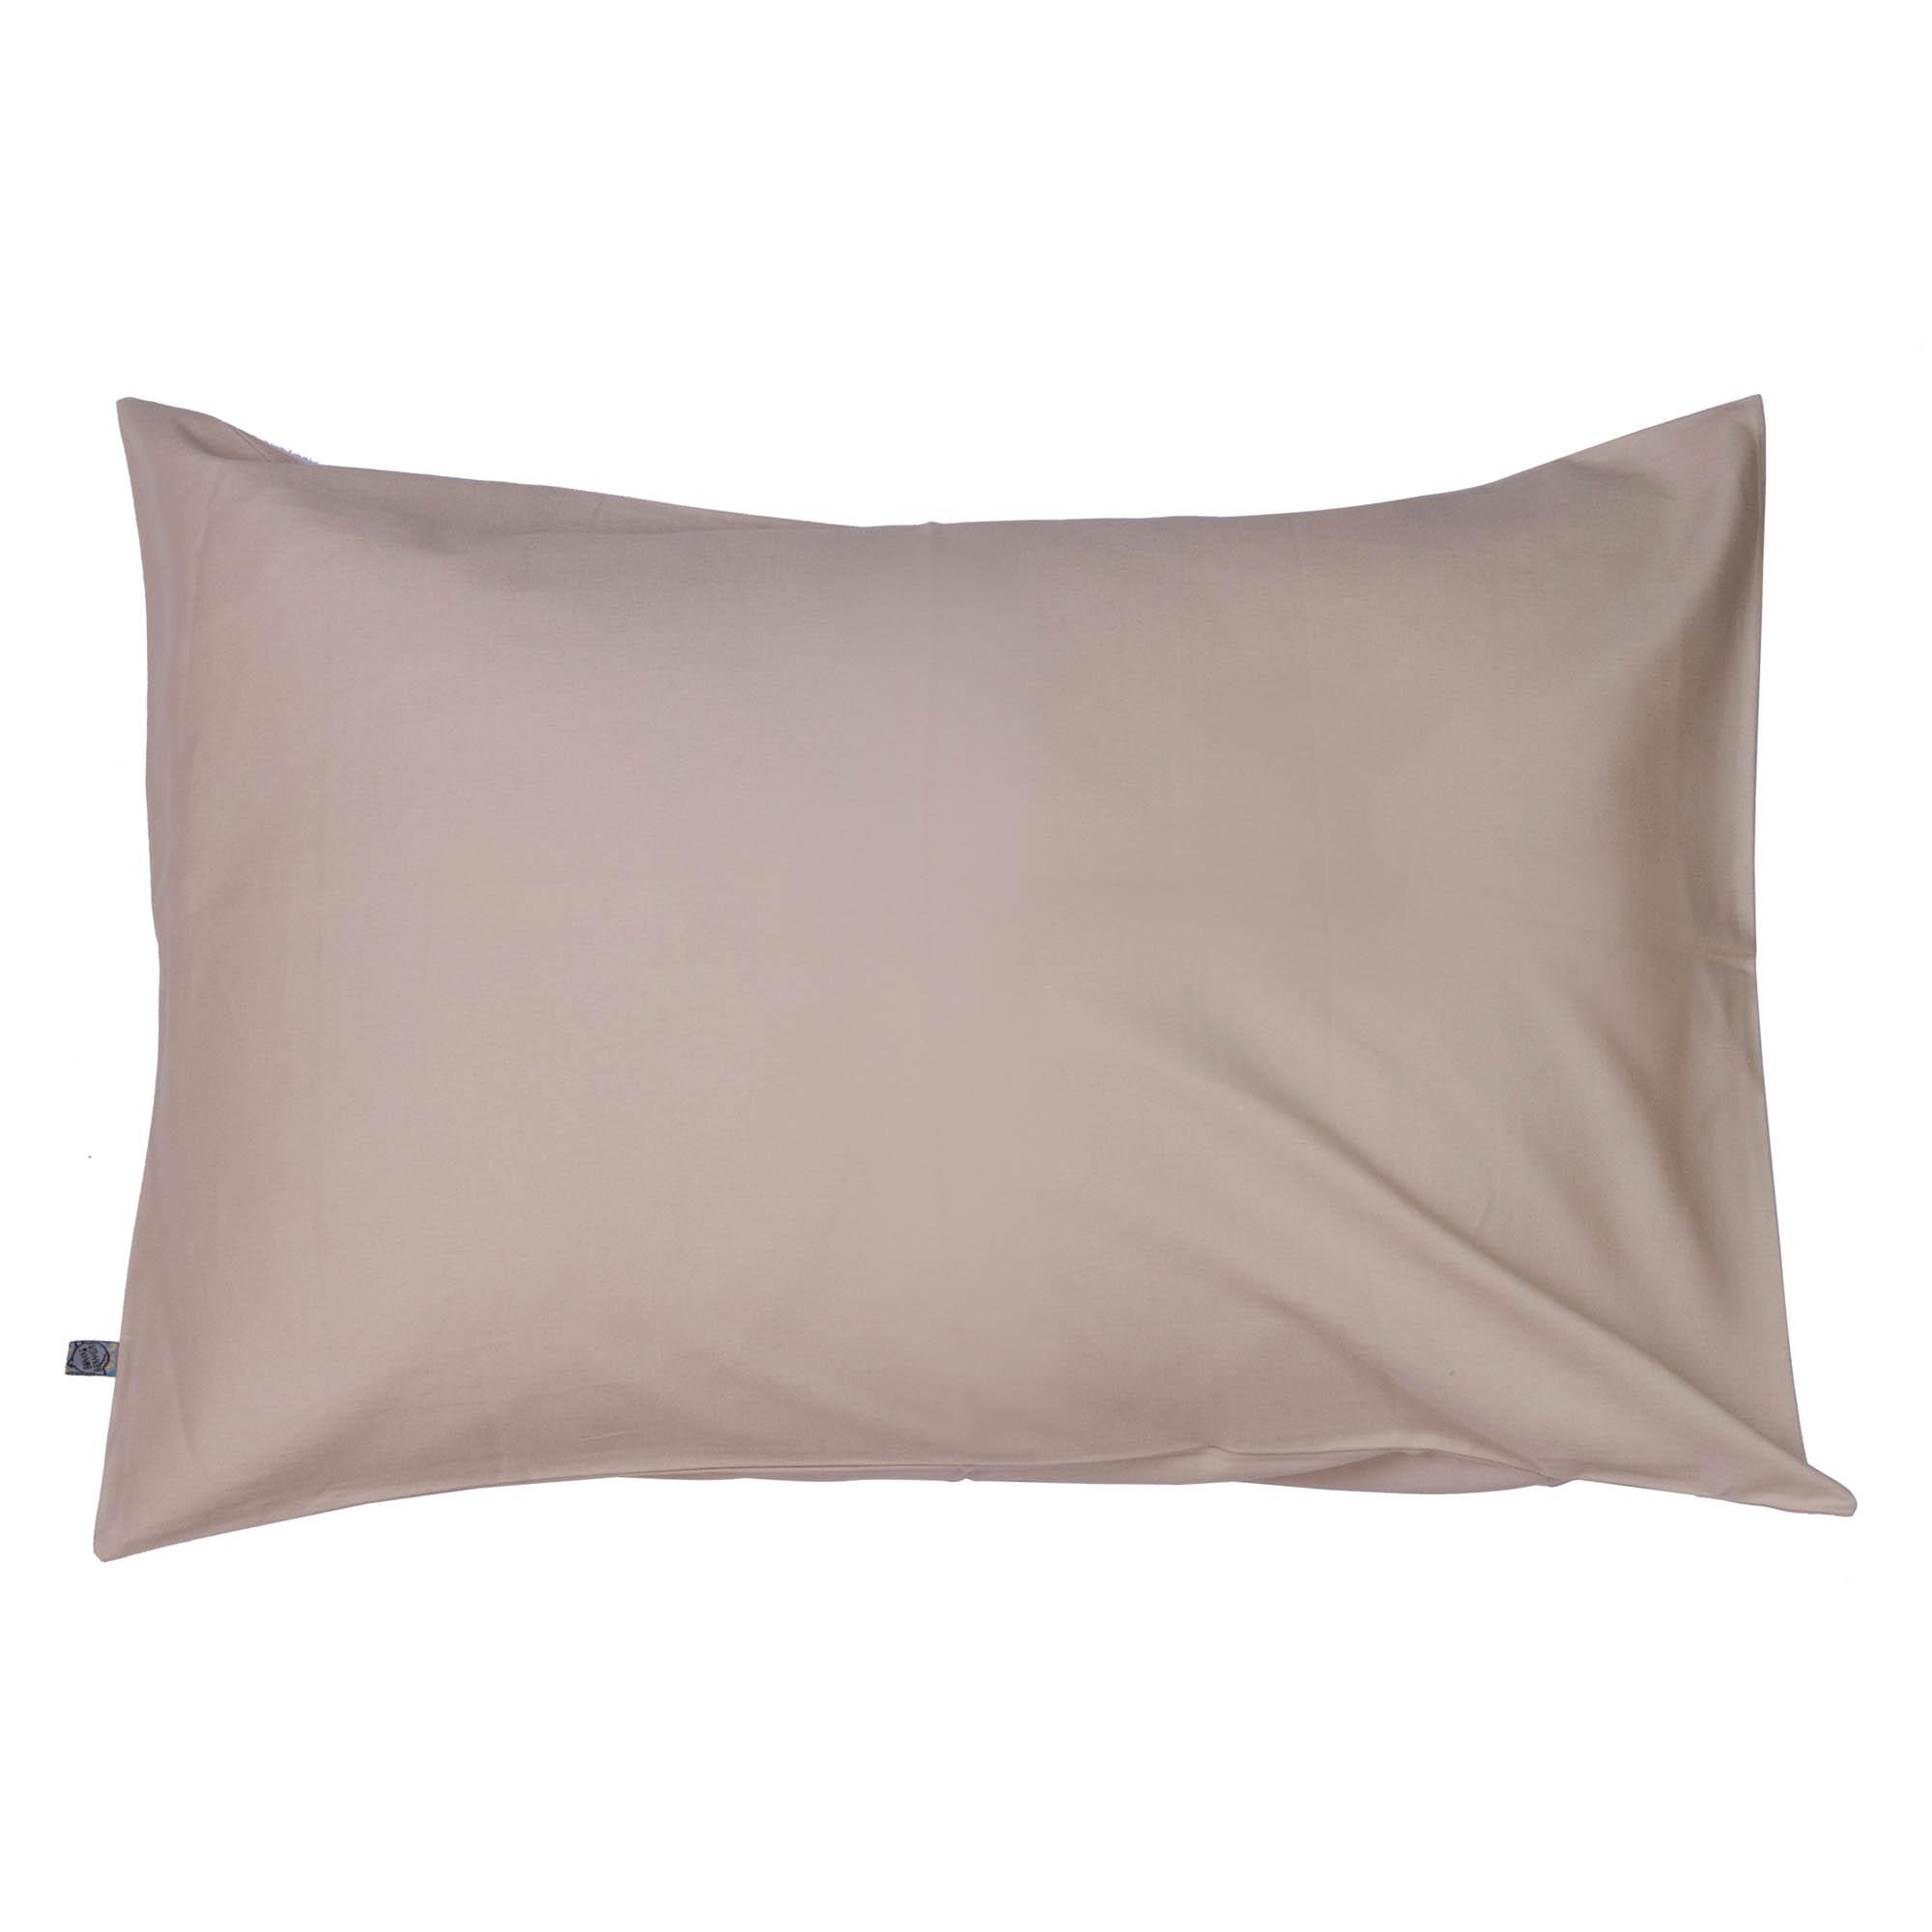 Porta travesseiro liso areia